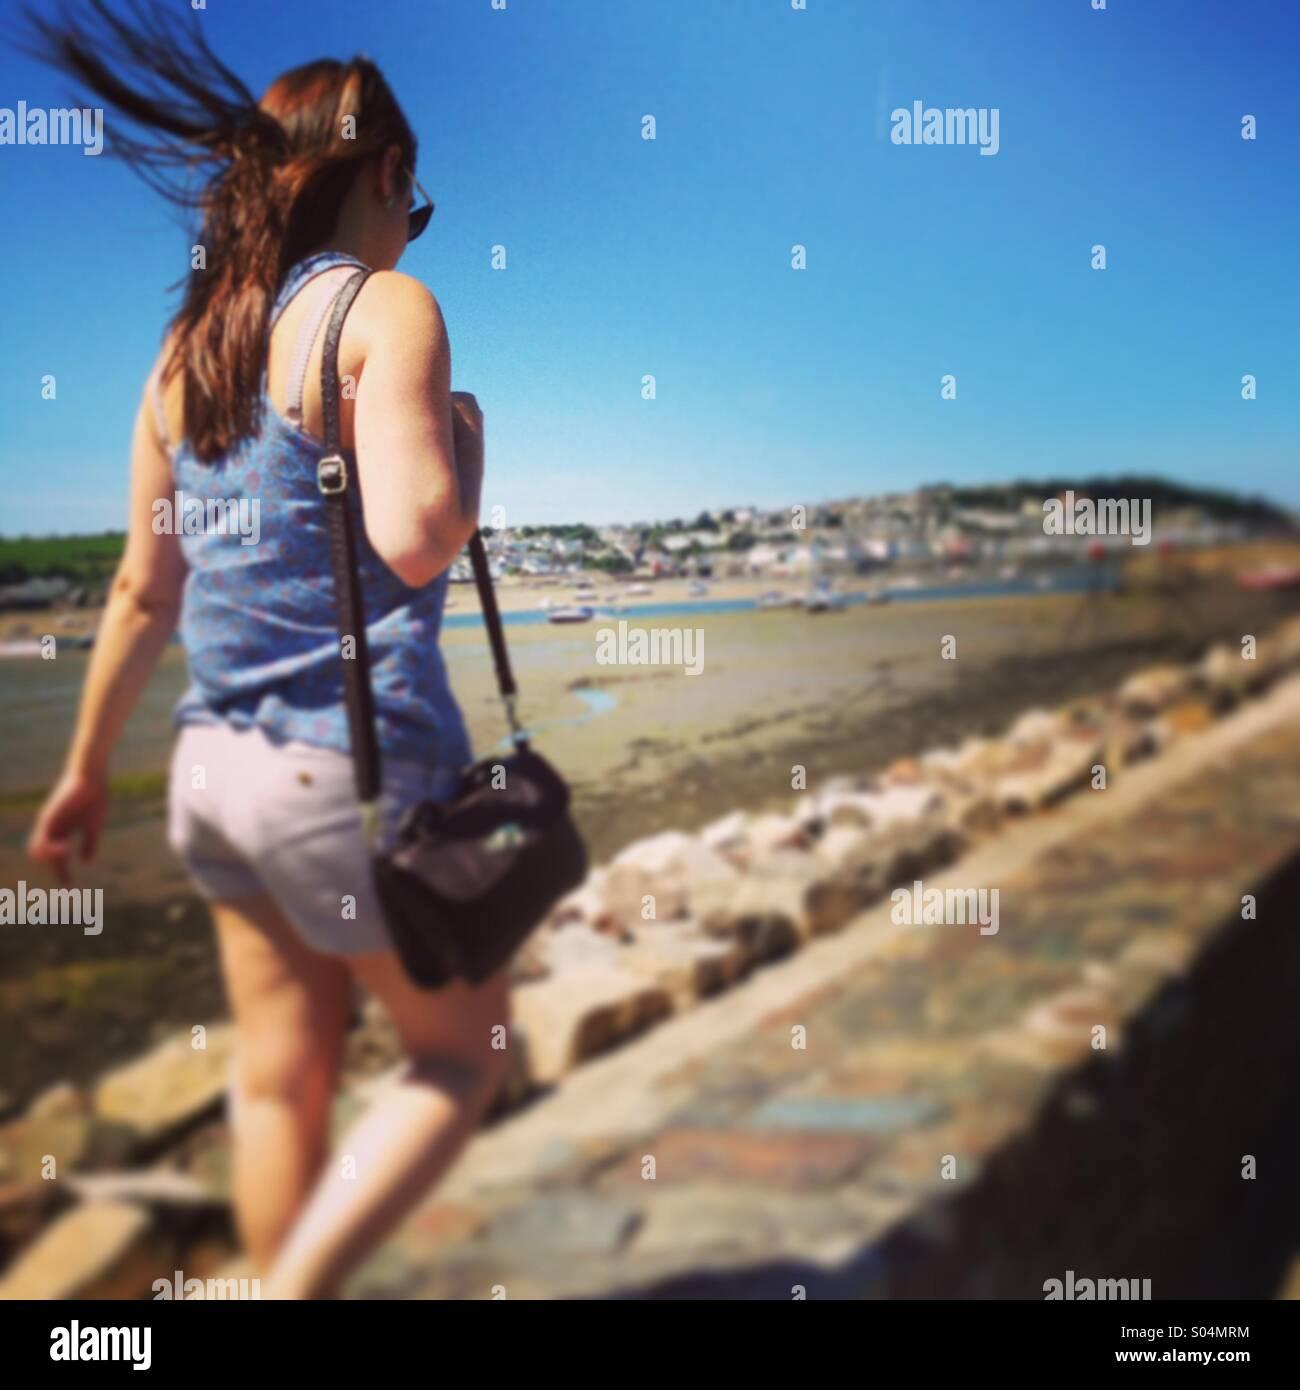 Windy beach walk Photo Stock